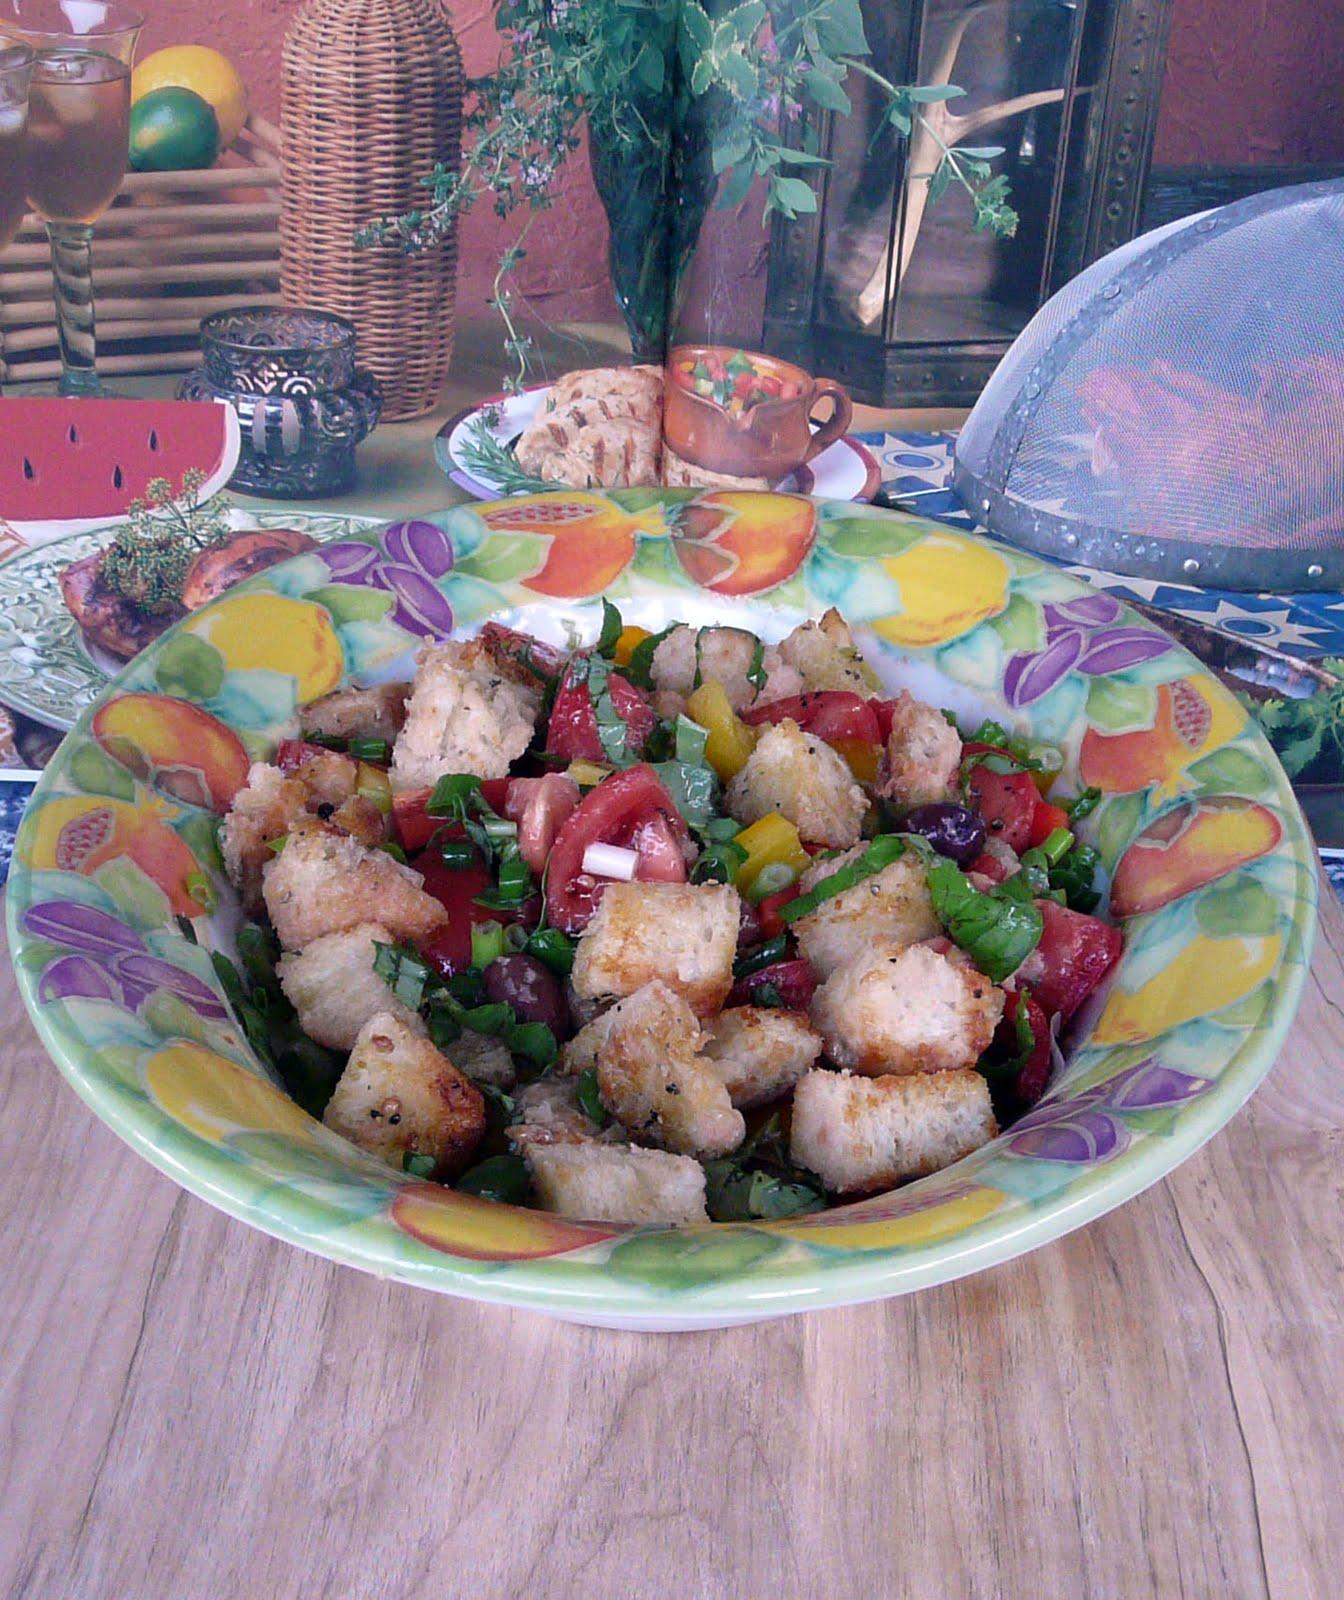 ... cross between a Panzanella Salad and the Zuni Cafe's Bread Salad